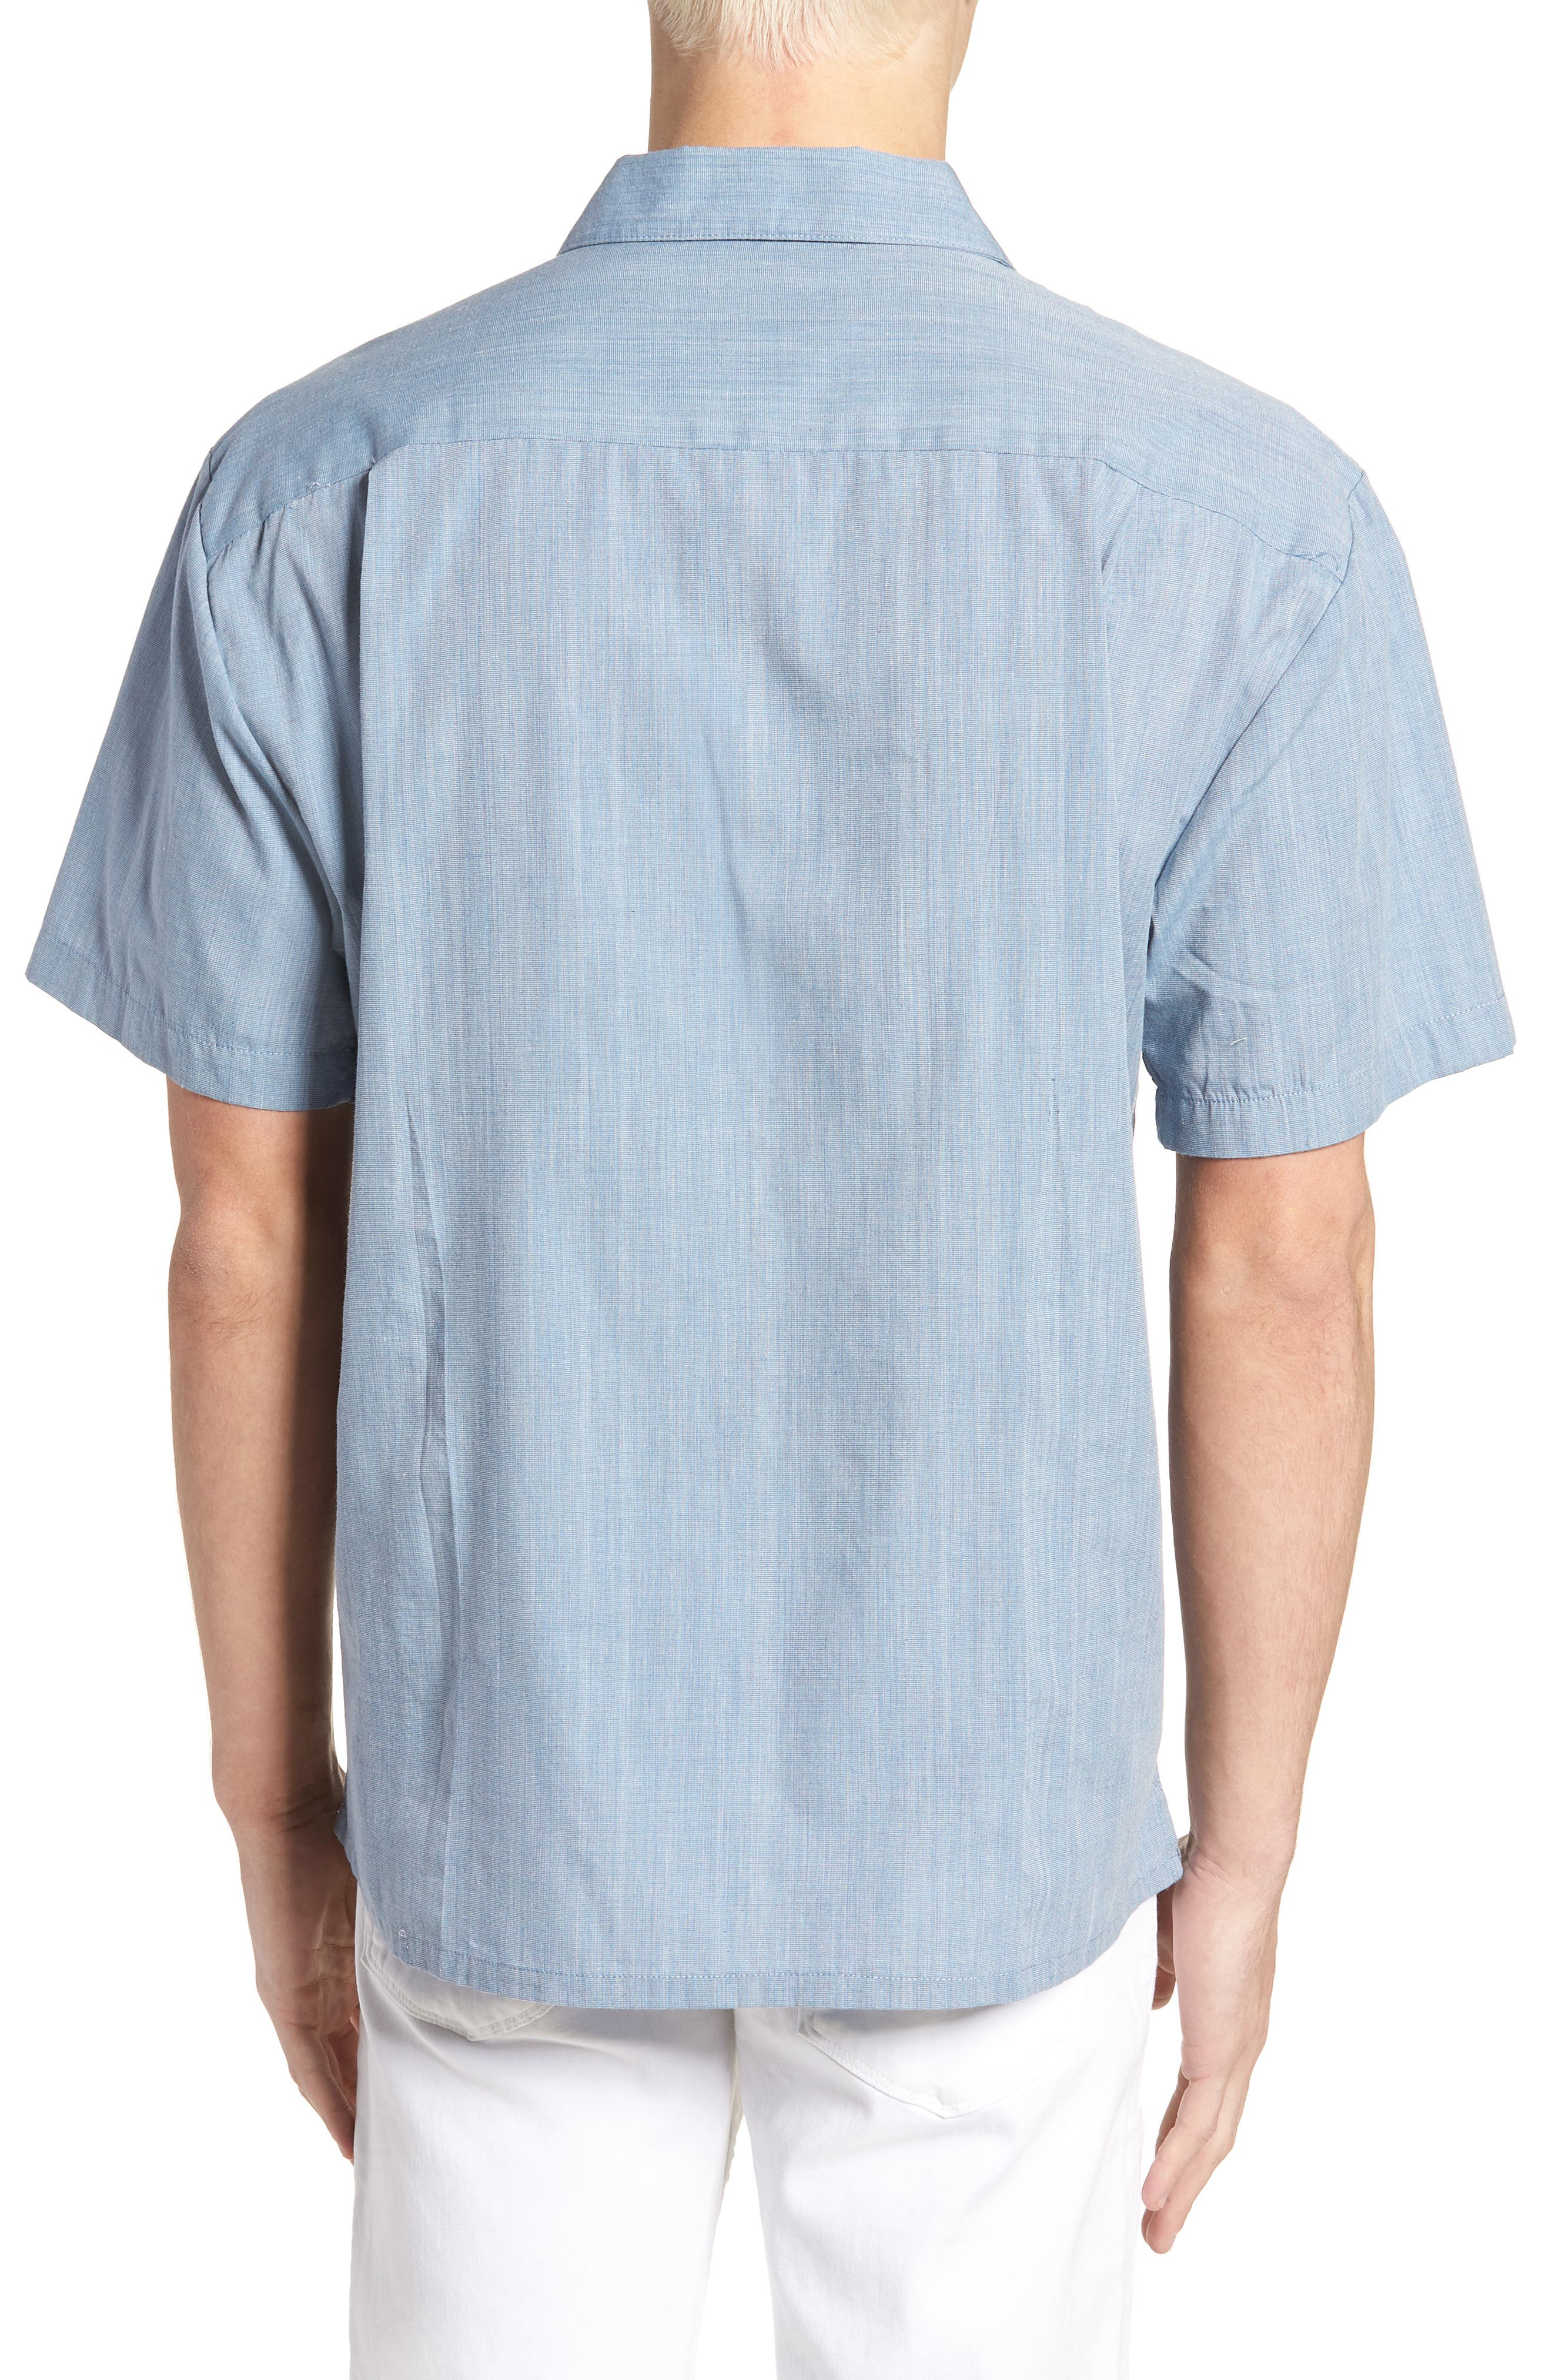 Cruze Woven Shirt,                             Alternate thumbnail 2, color,                             400